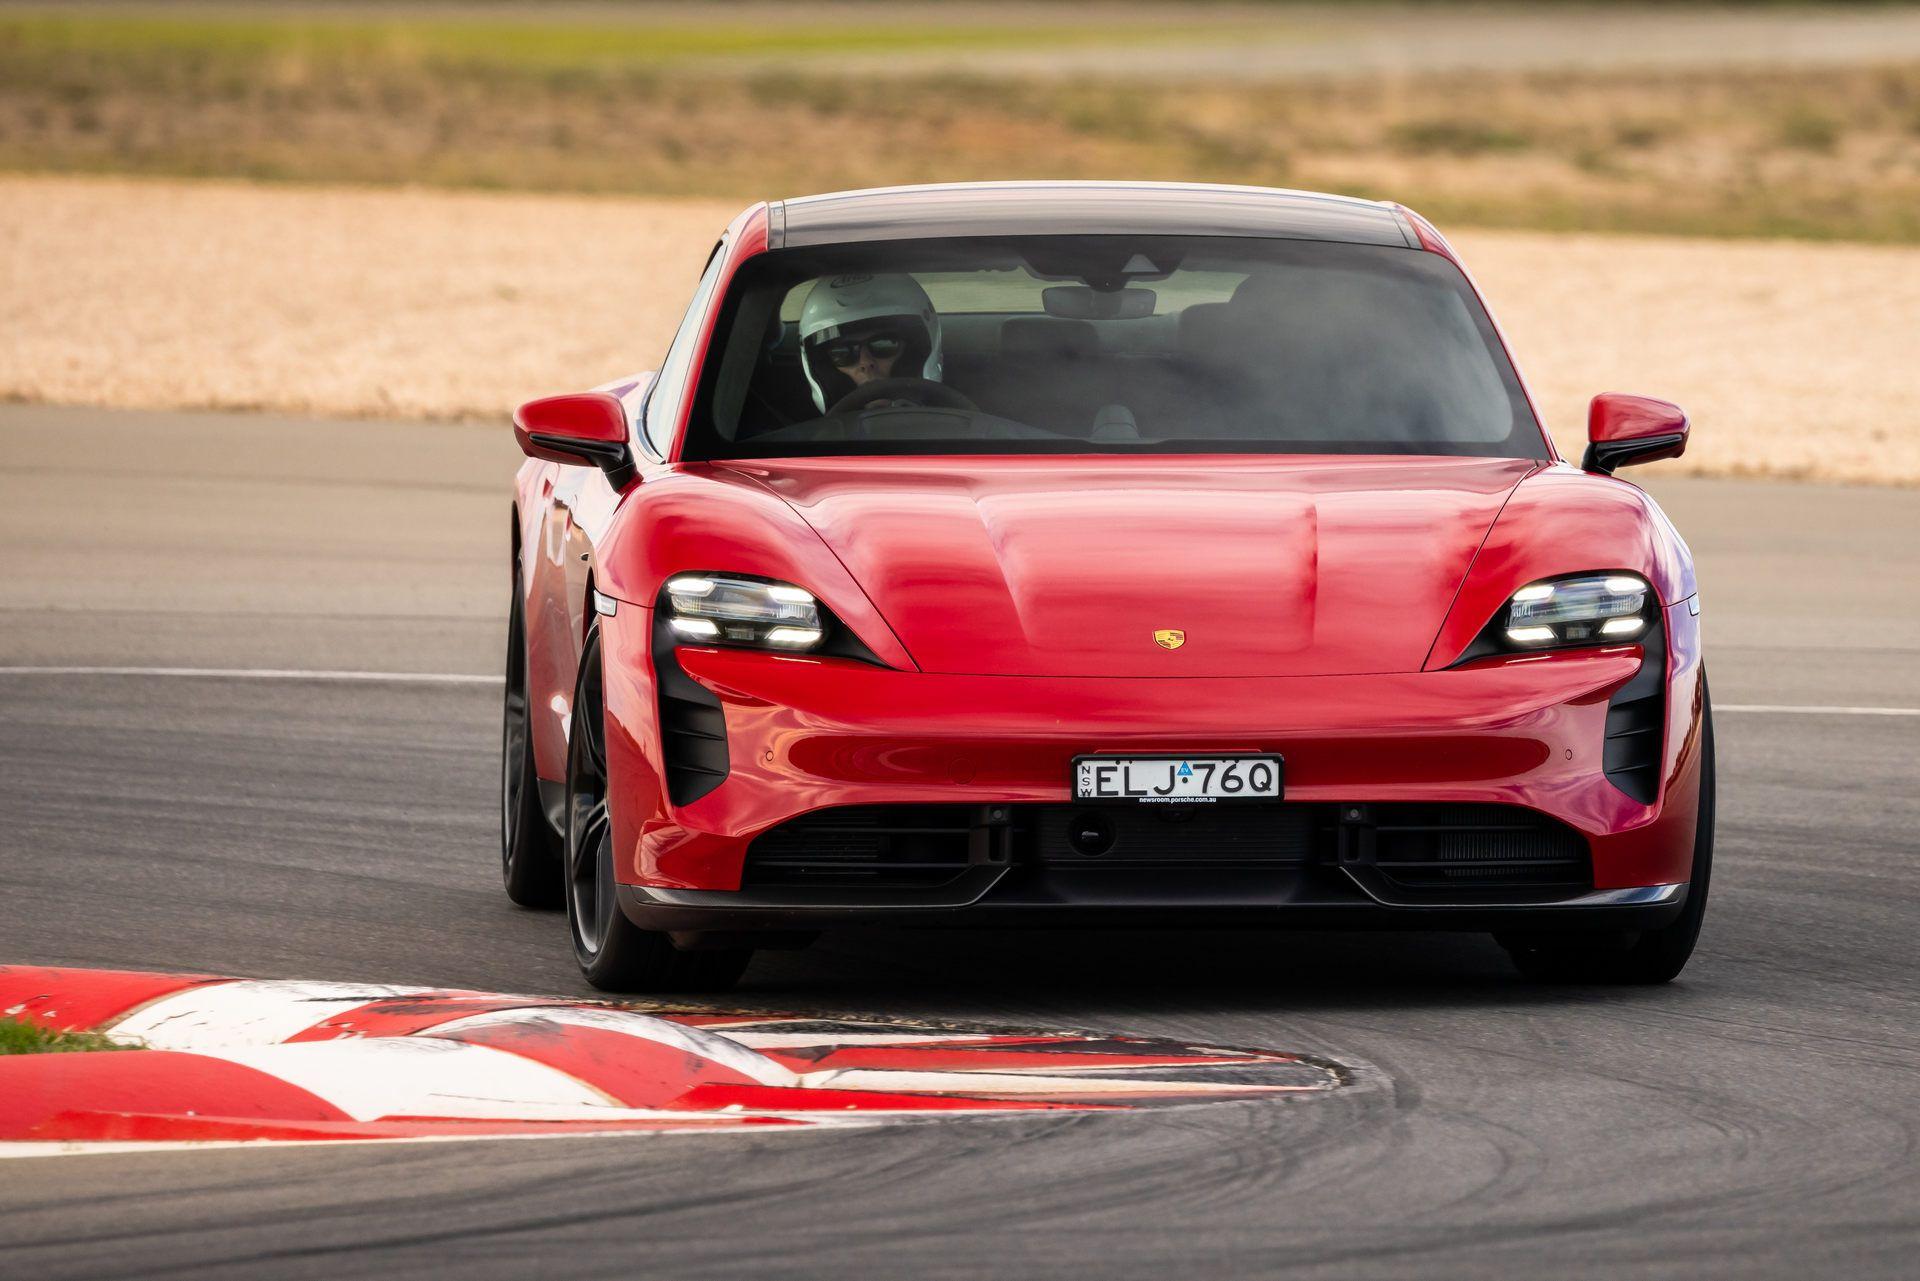 Porsche-Taycan-Turbo-S-The-Bend-Motorsport-Park-11